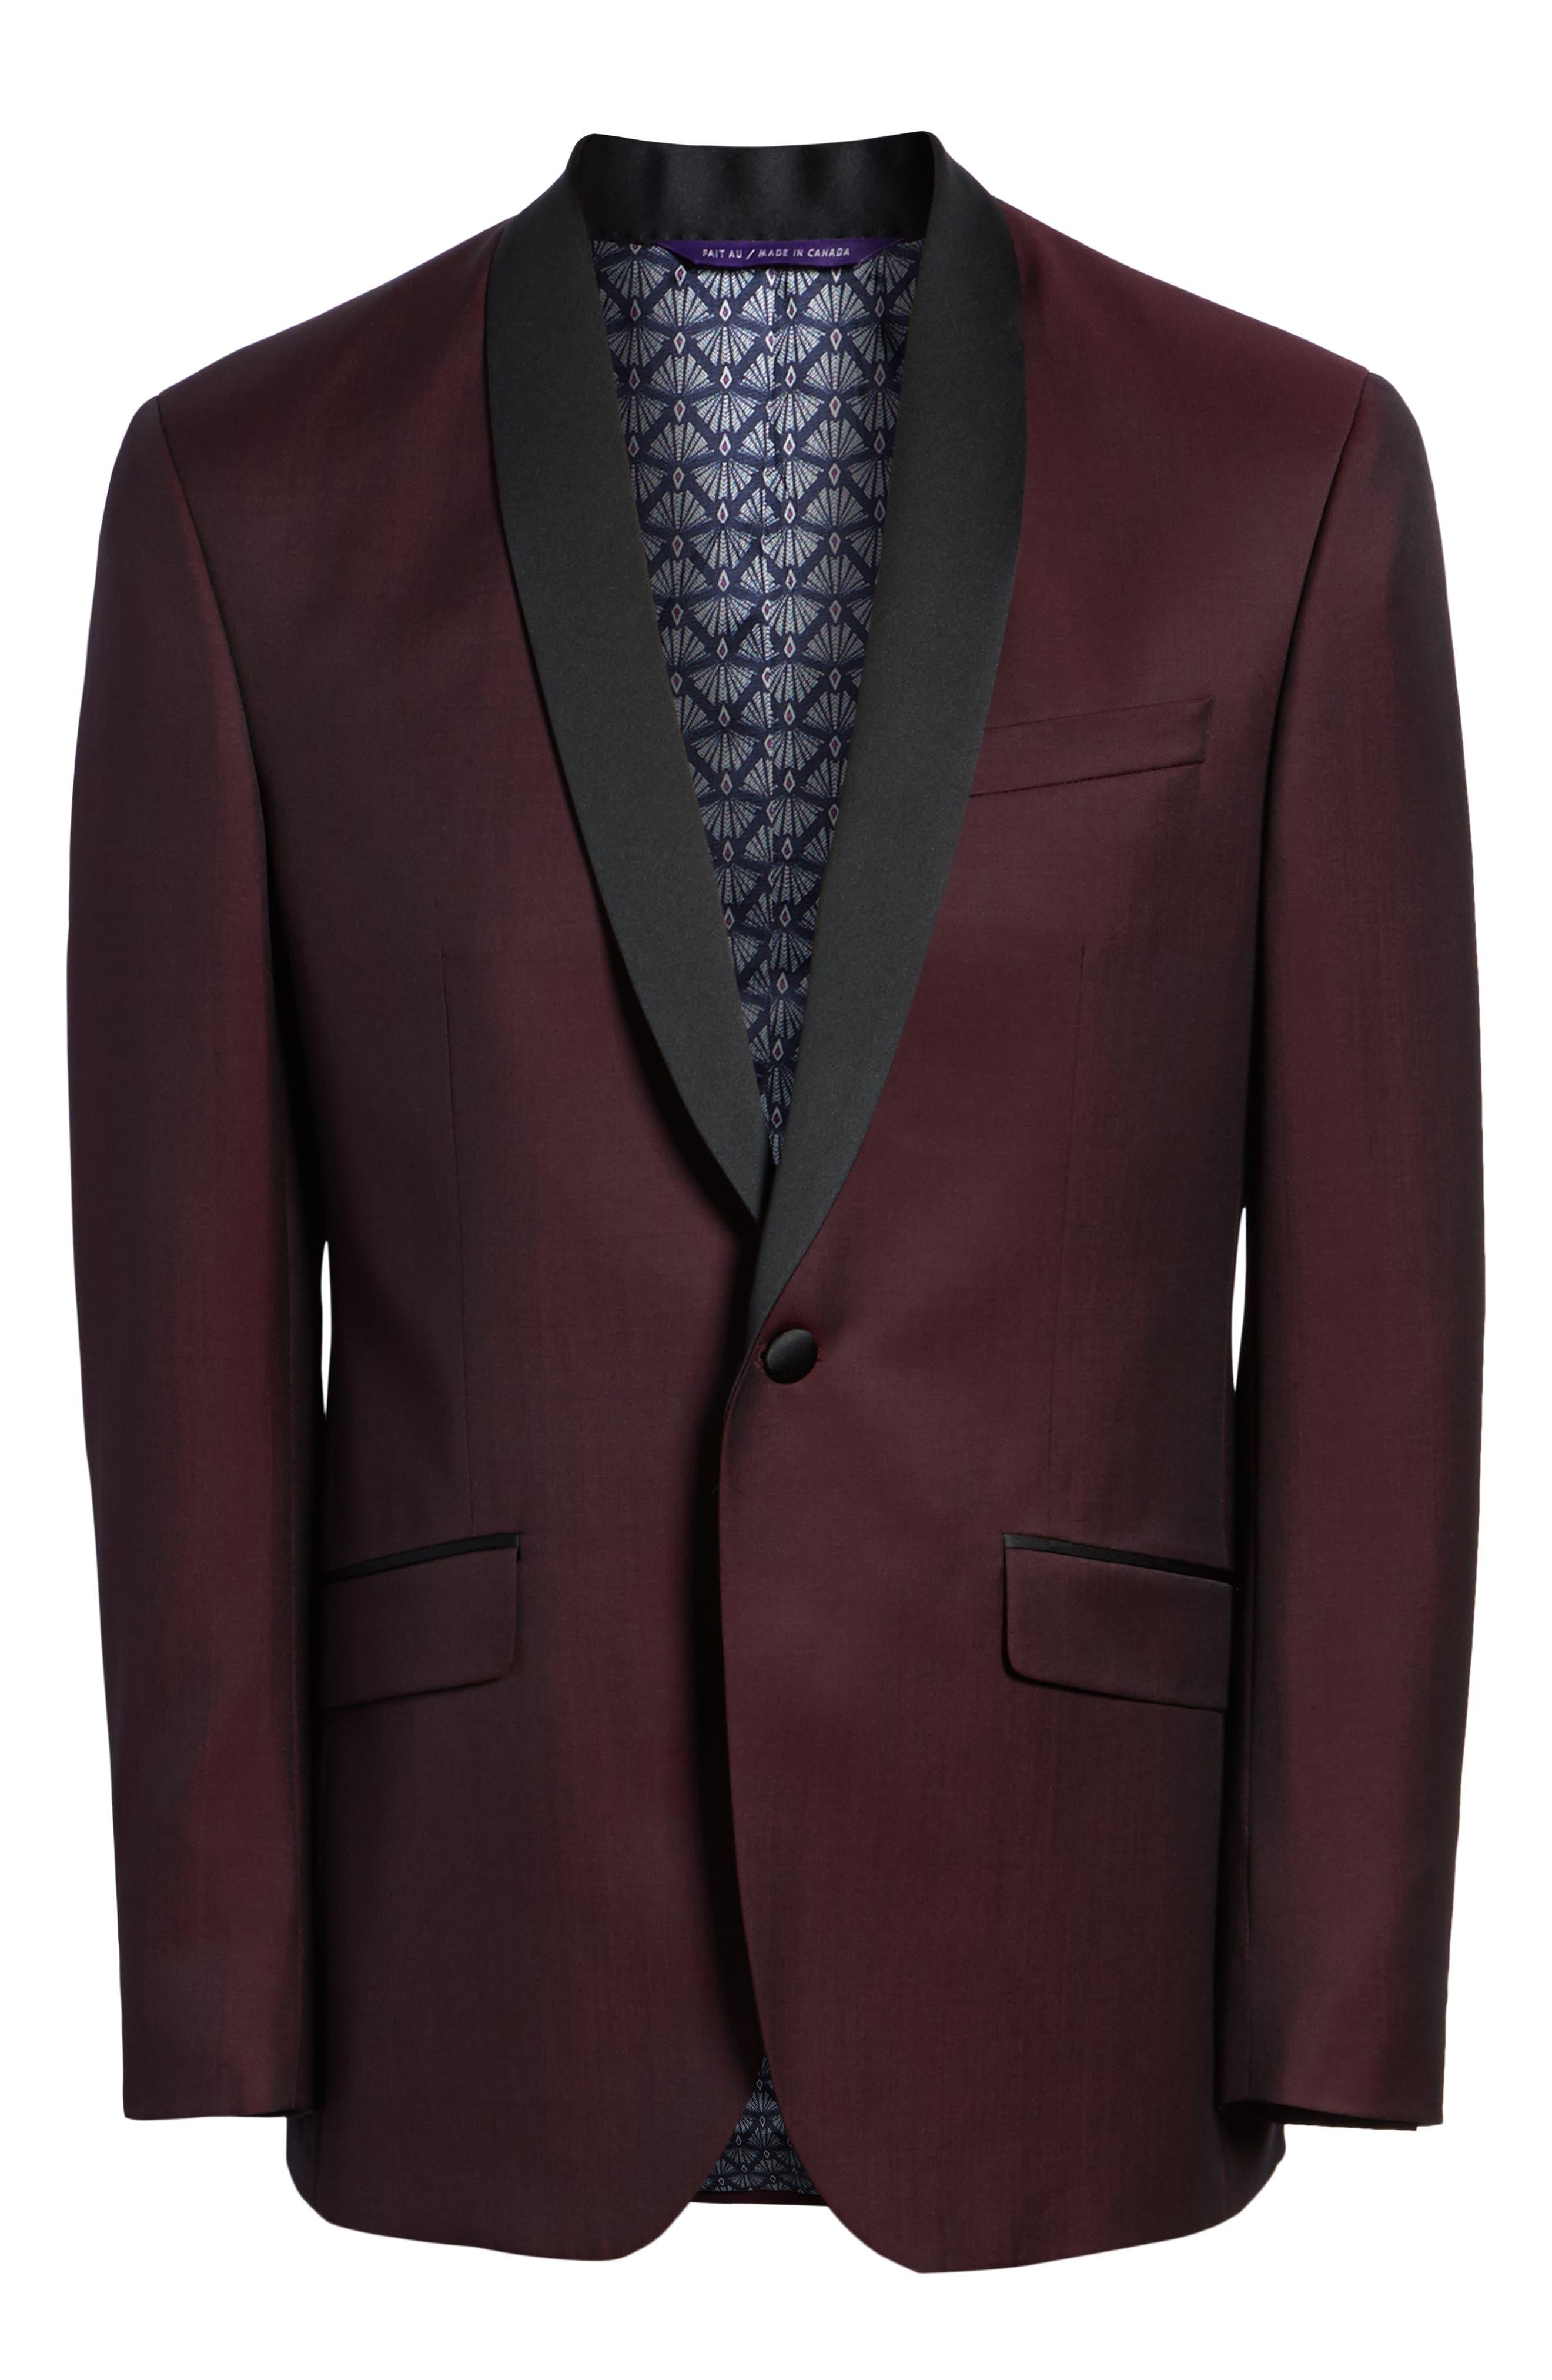 Josh Trim Fit Wool & Mohair Dinner Jacket,                             Alternate thumbnail 5, color,                             BERRY